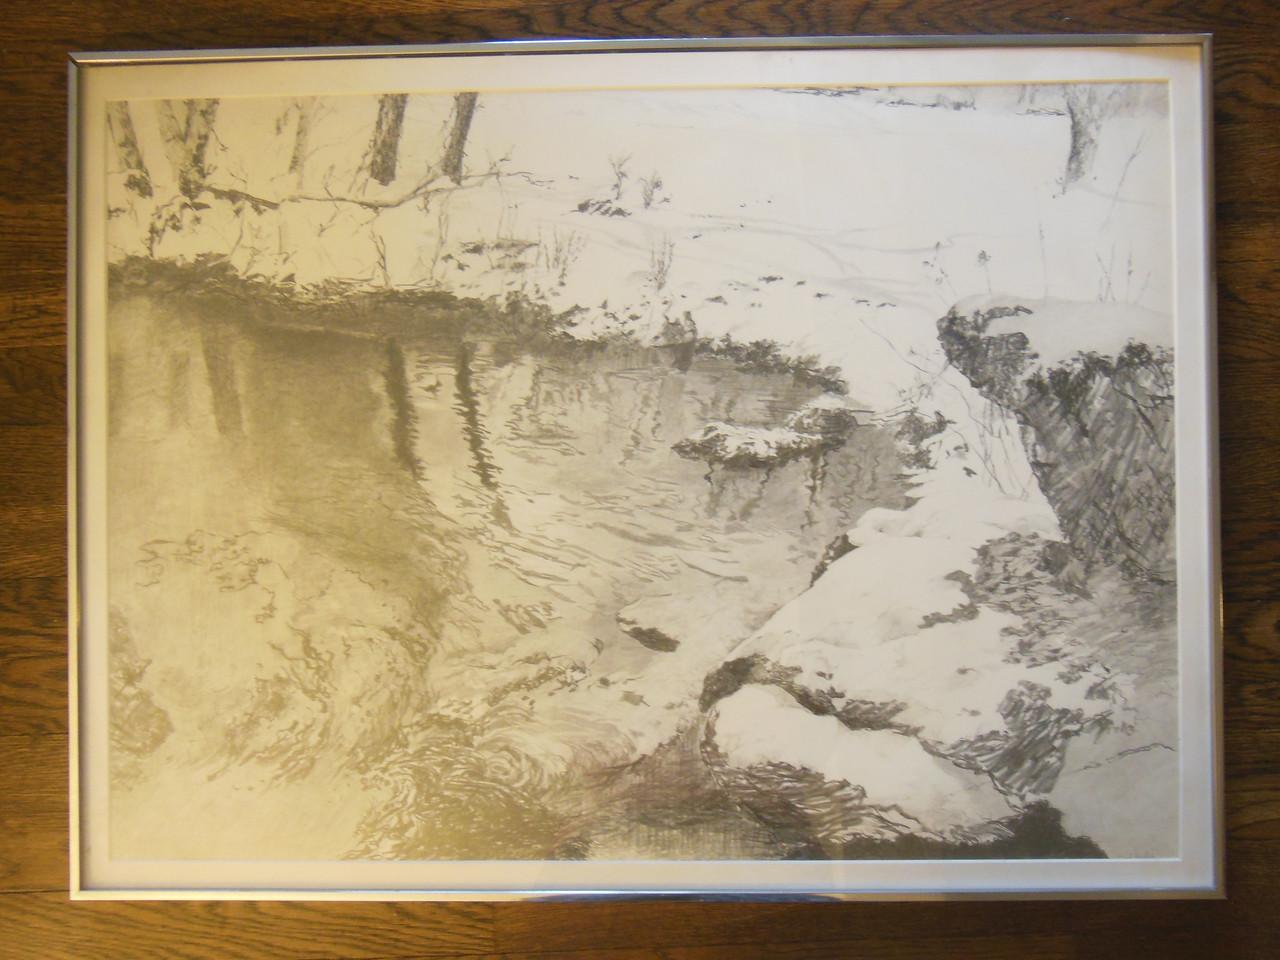 Carol Kardon. Snowy Landscape. Framed drawing